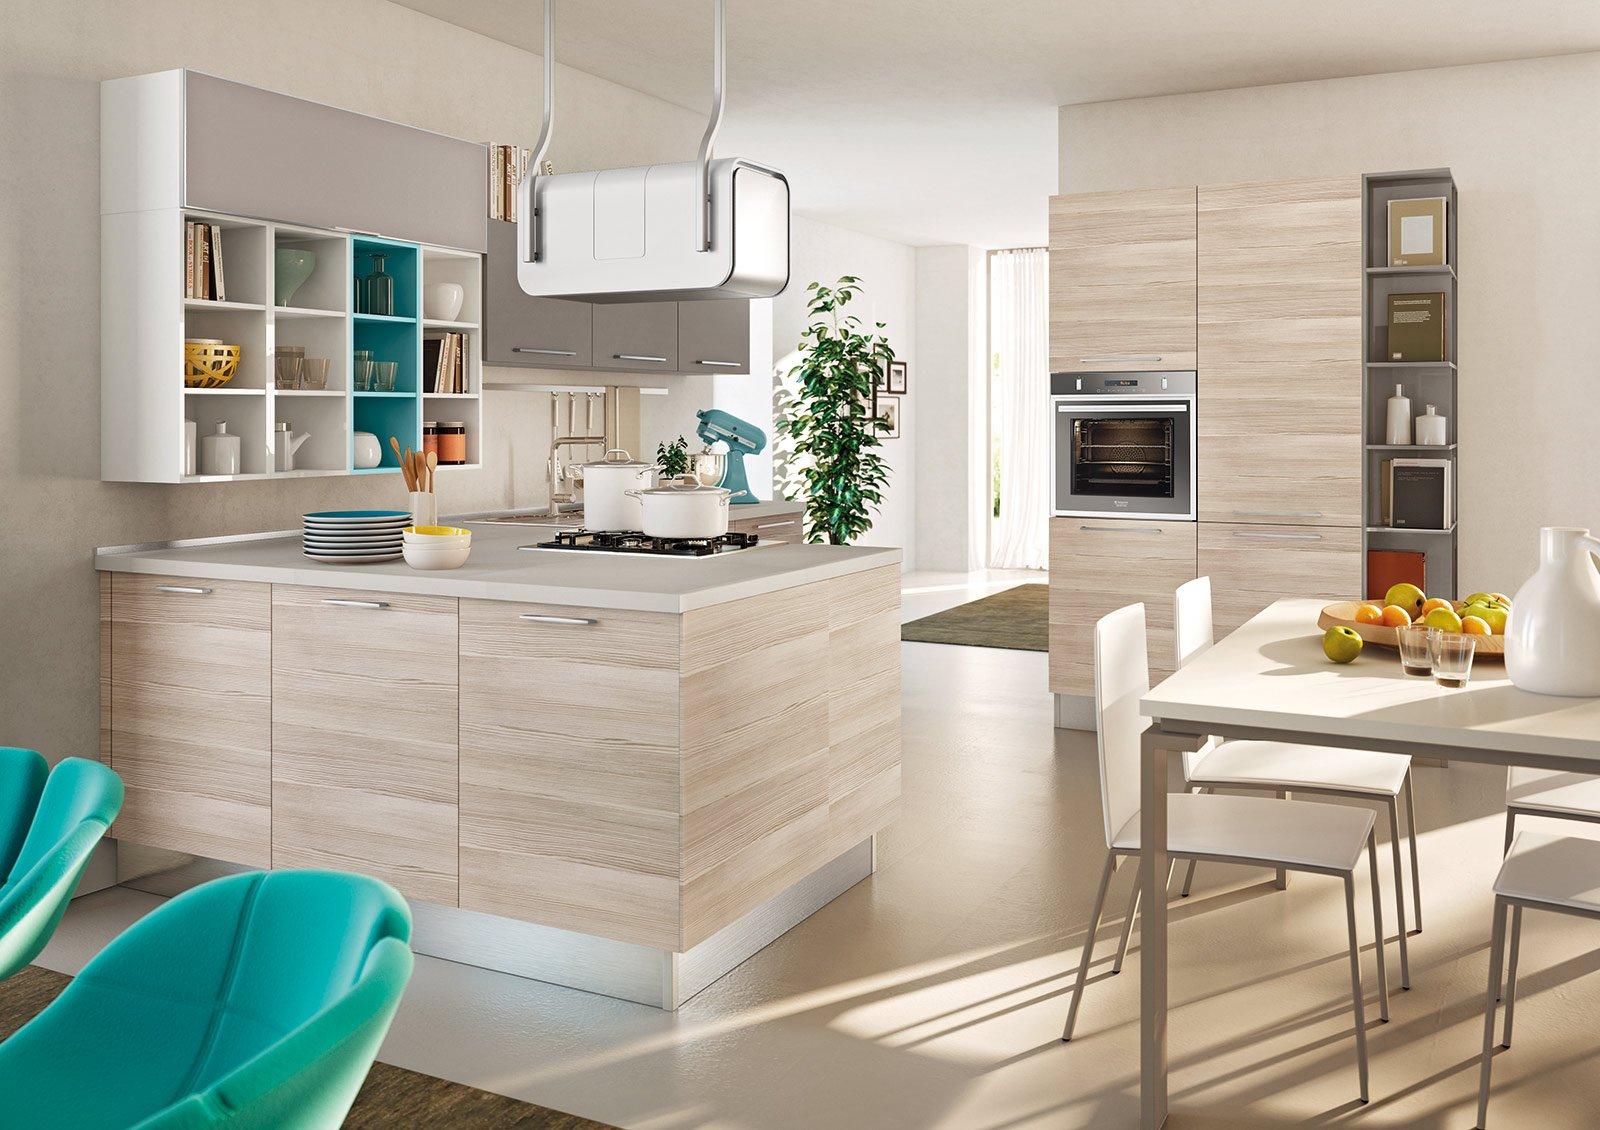 Cucina bianca e legno wenge - Colore parete cucina noce ...